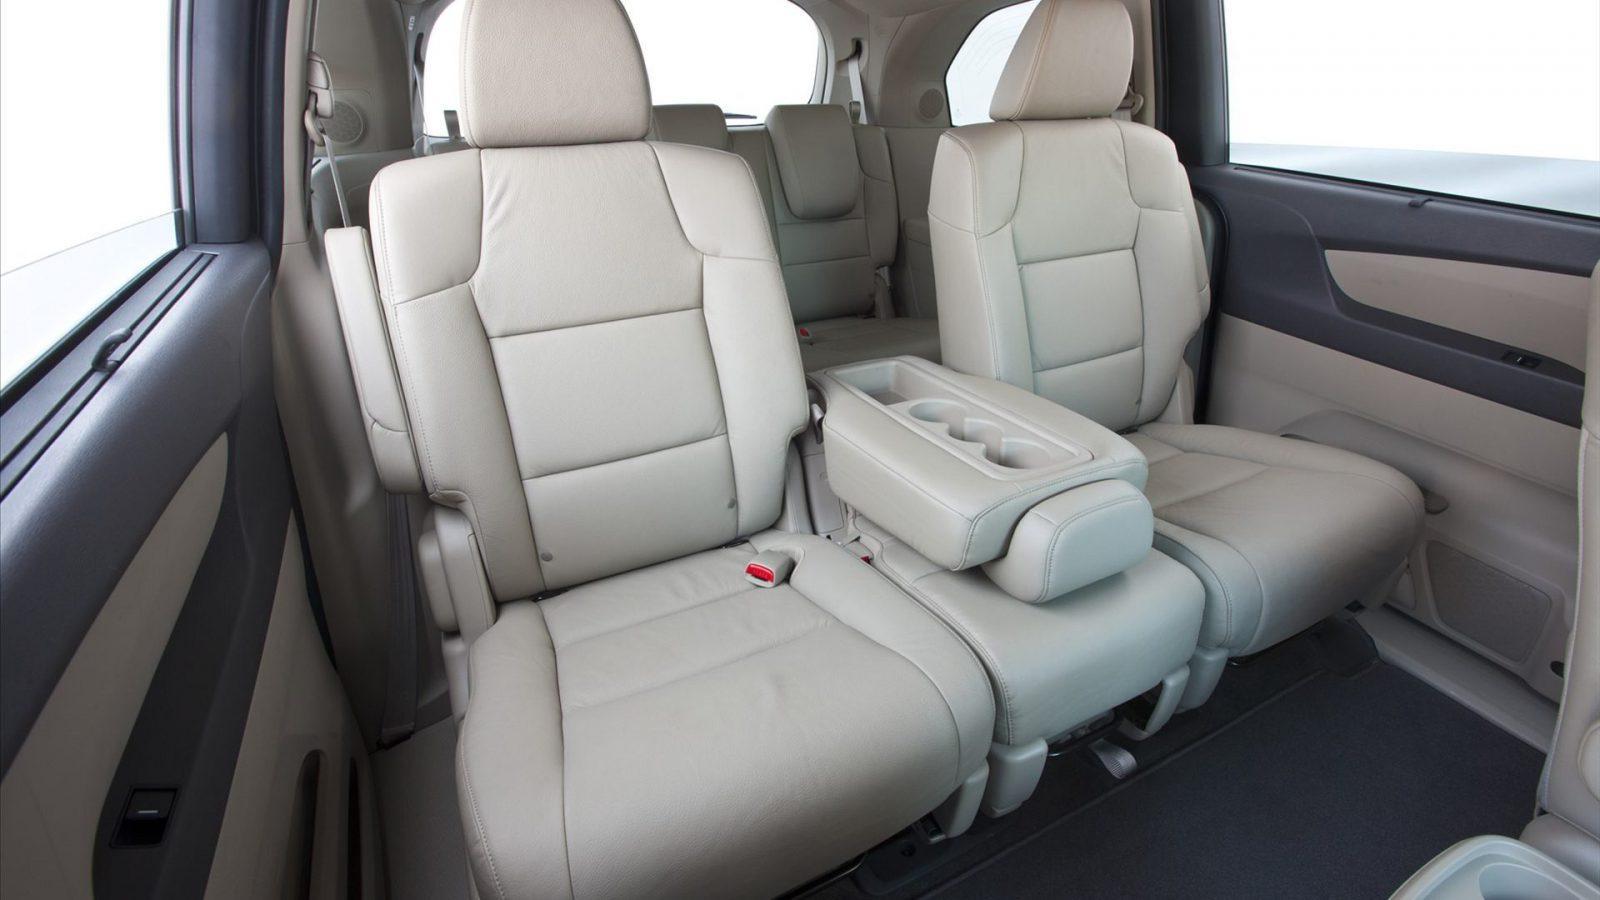 Honda odyssey car seat covers velcromag for Honda odyssey seating